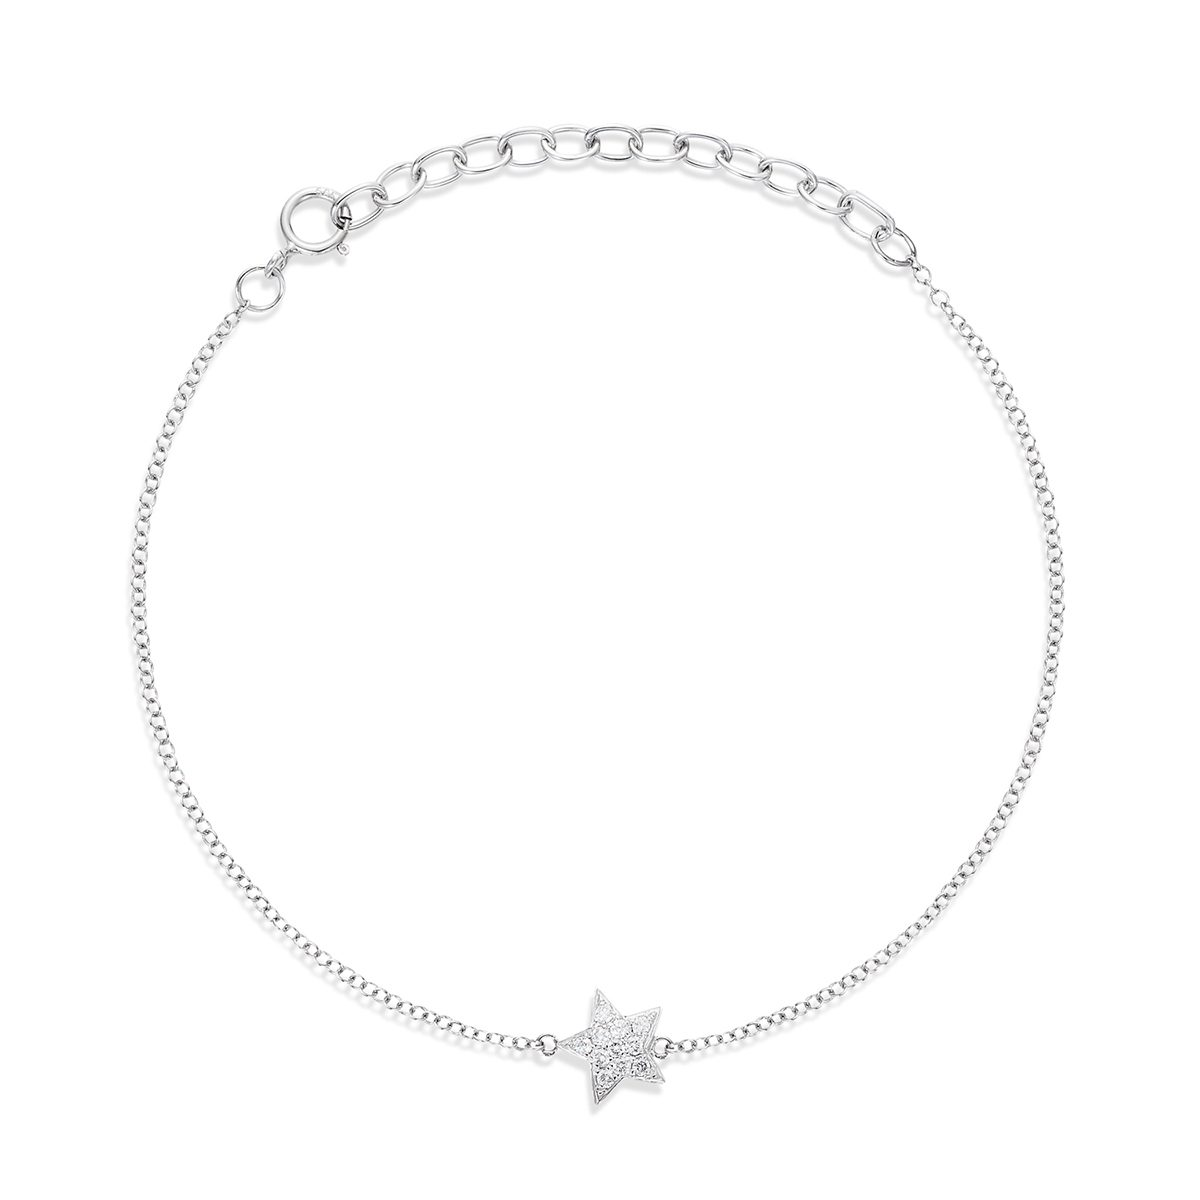 Robinson-Pelham-Ltd-Bracelets-5